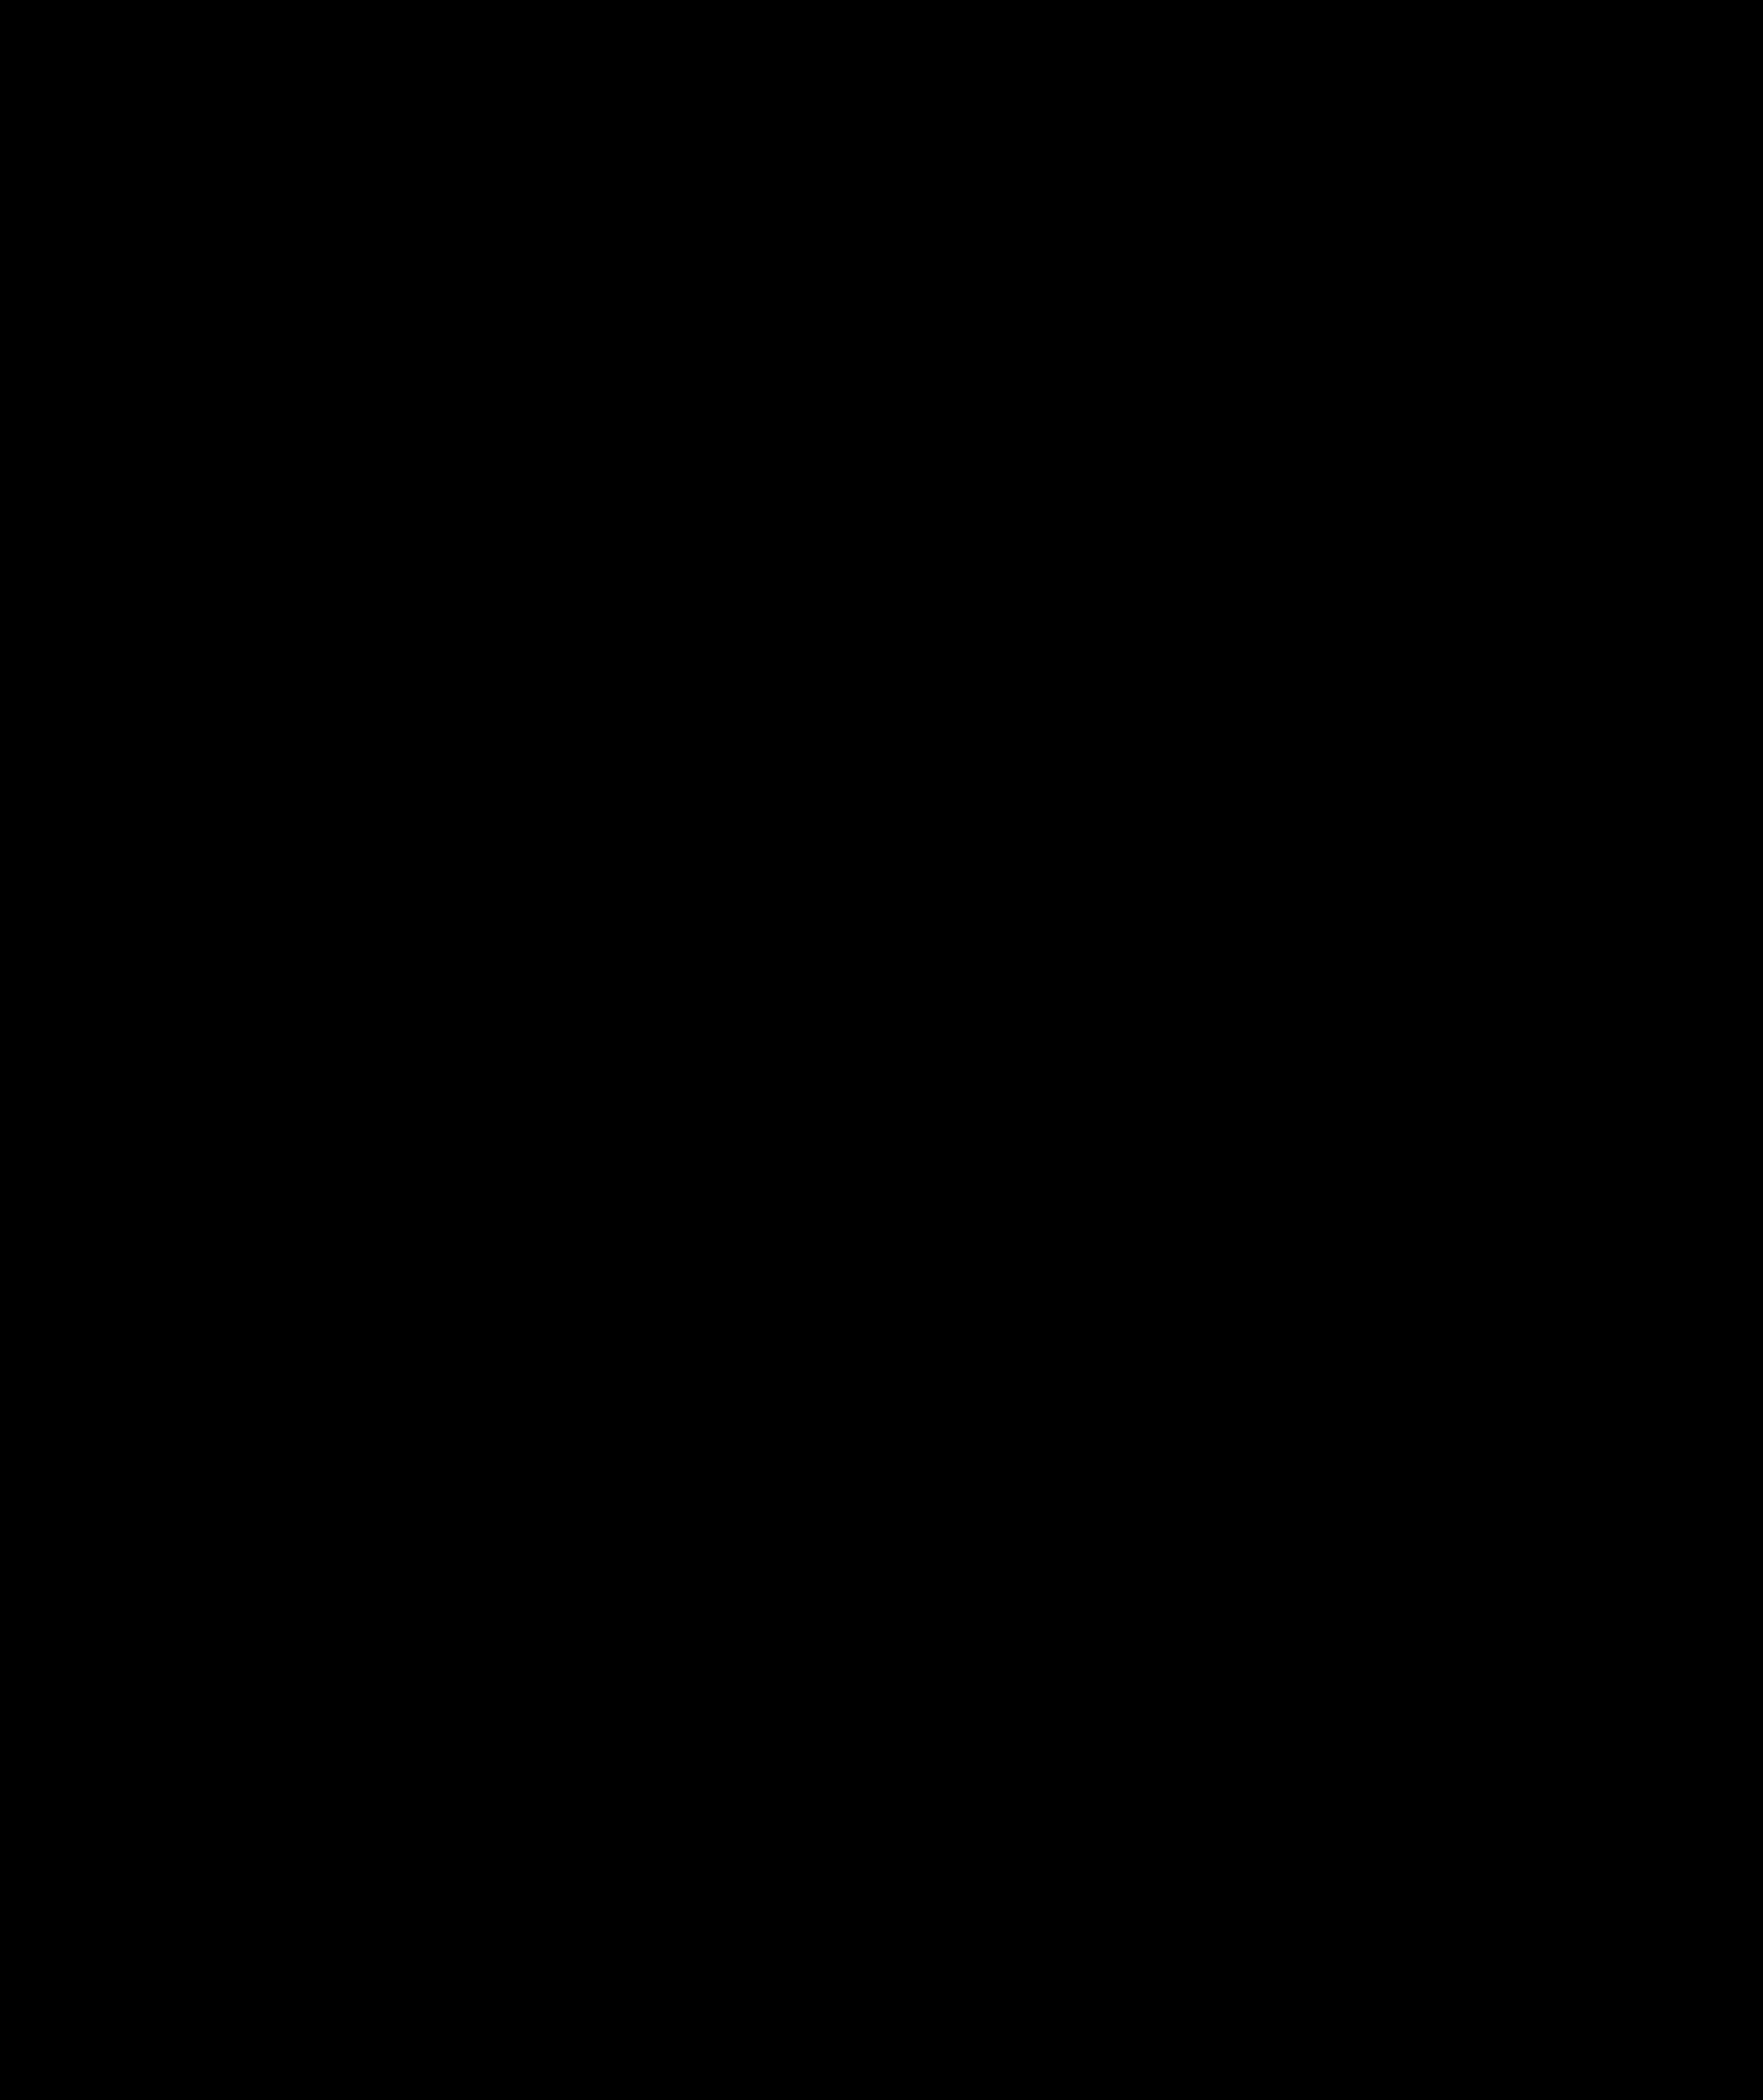 Logo clipart apple. File hollow svg wikimedia